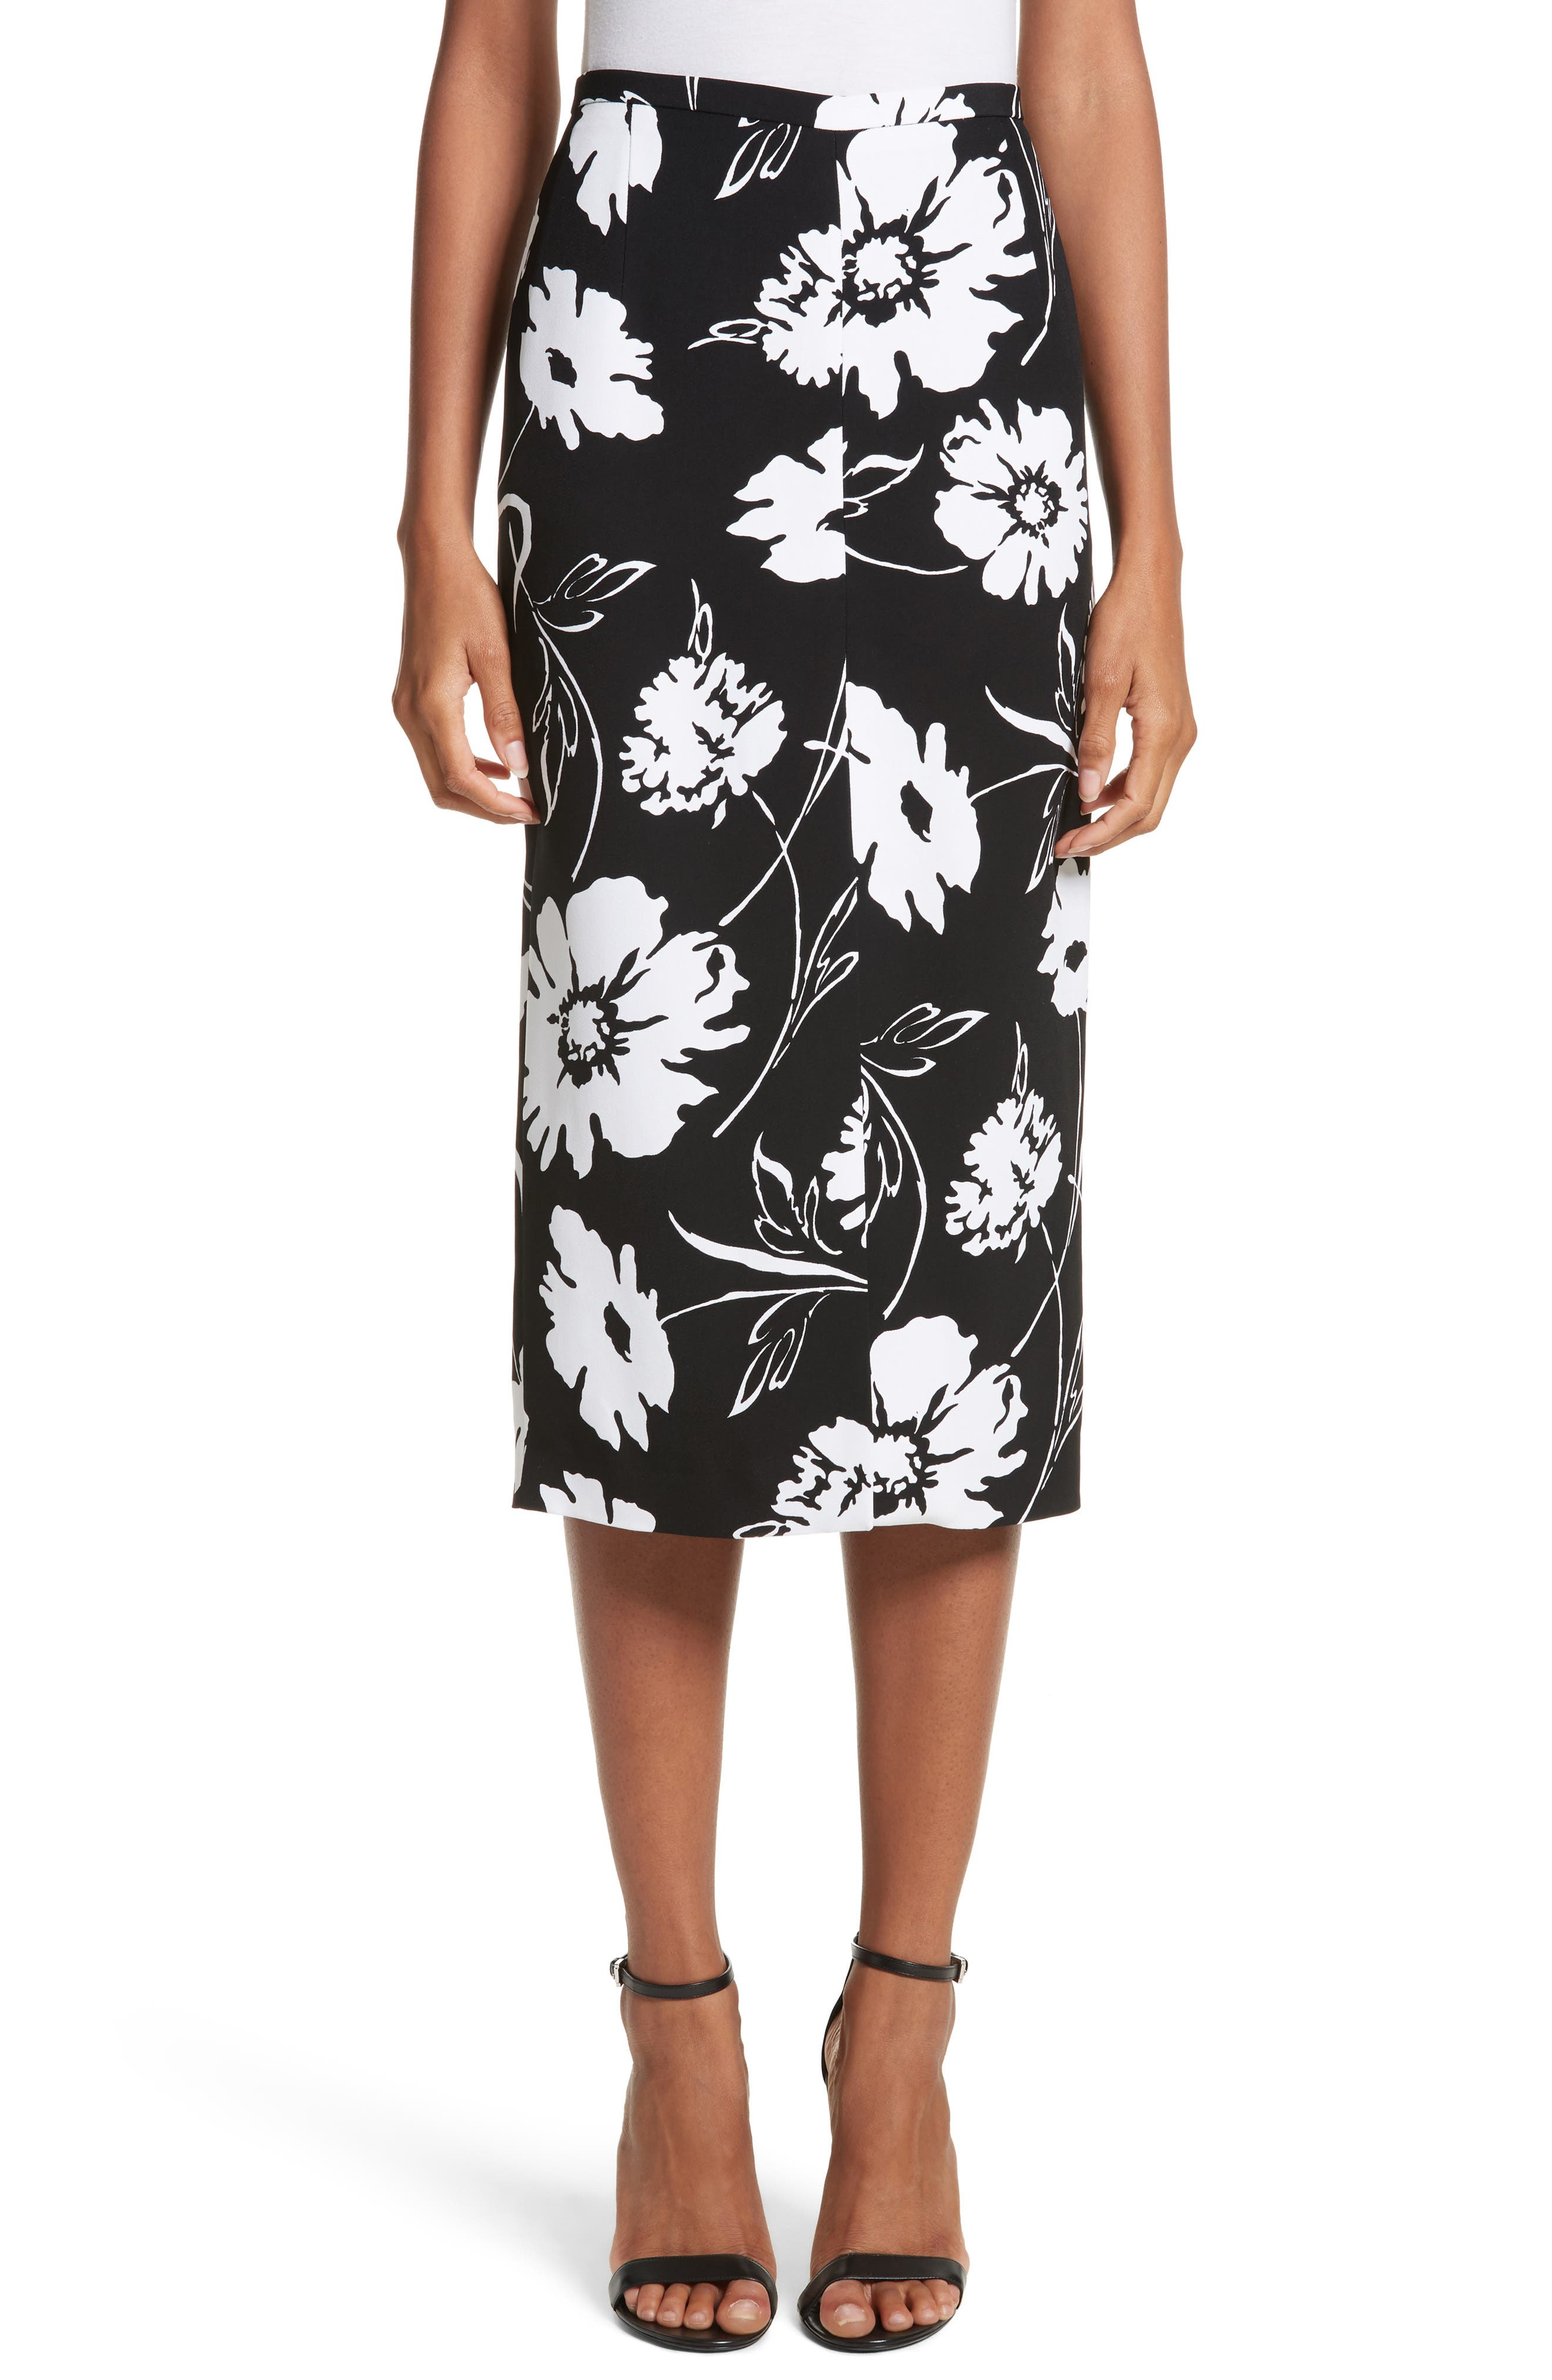 Floral Print Pencil Skirt,                         Main,                         color, Black / White